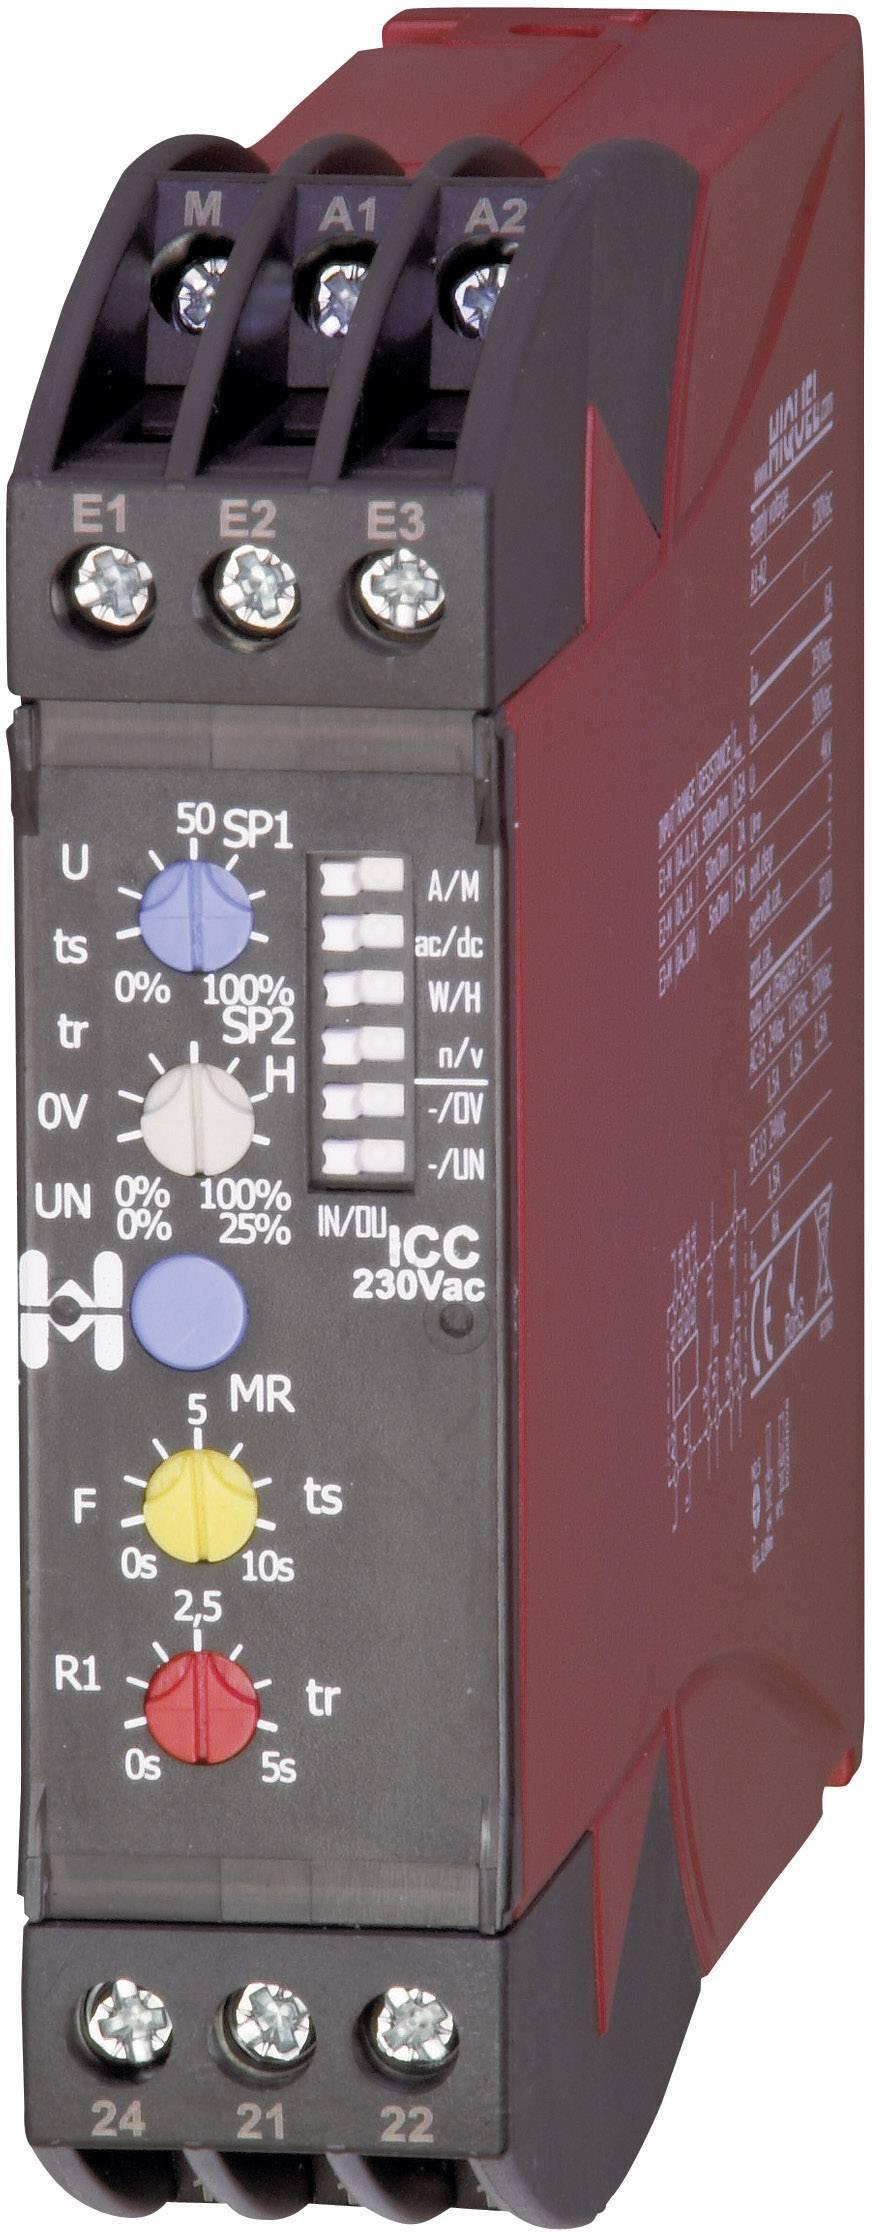 Monitorovací relé in-case Hiquel, ICC 24Vac, in-case